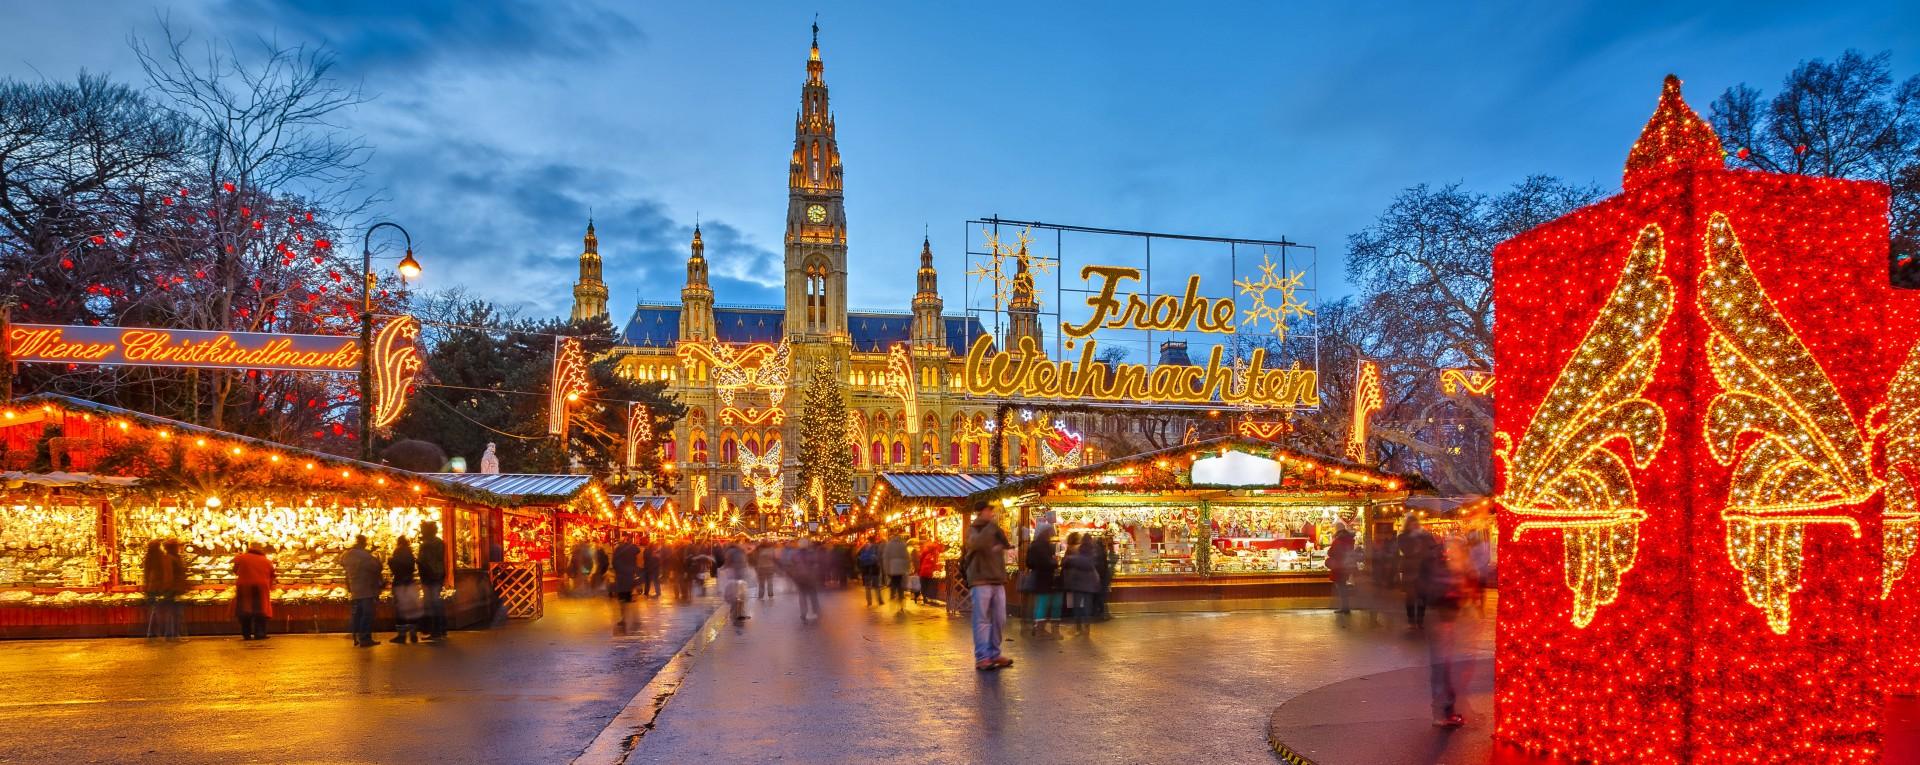 vienna christmas market - Vienna At Christmas